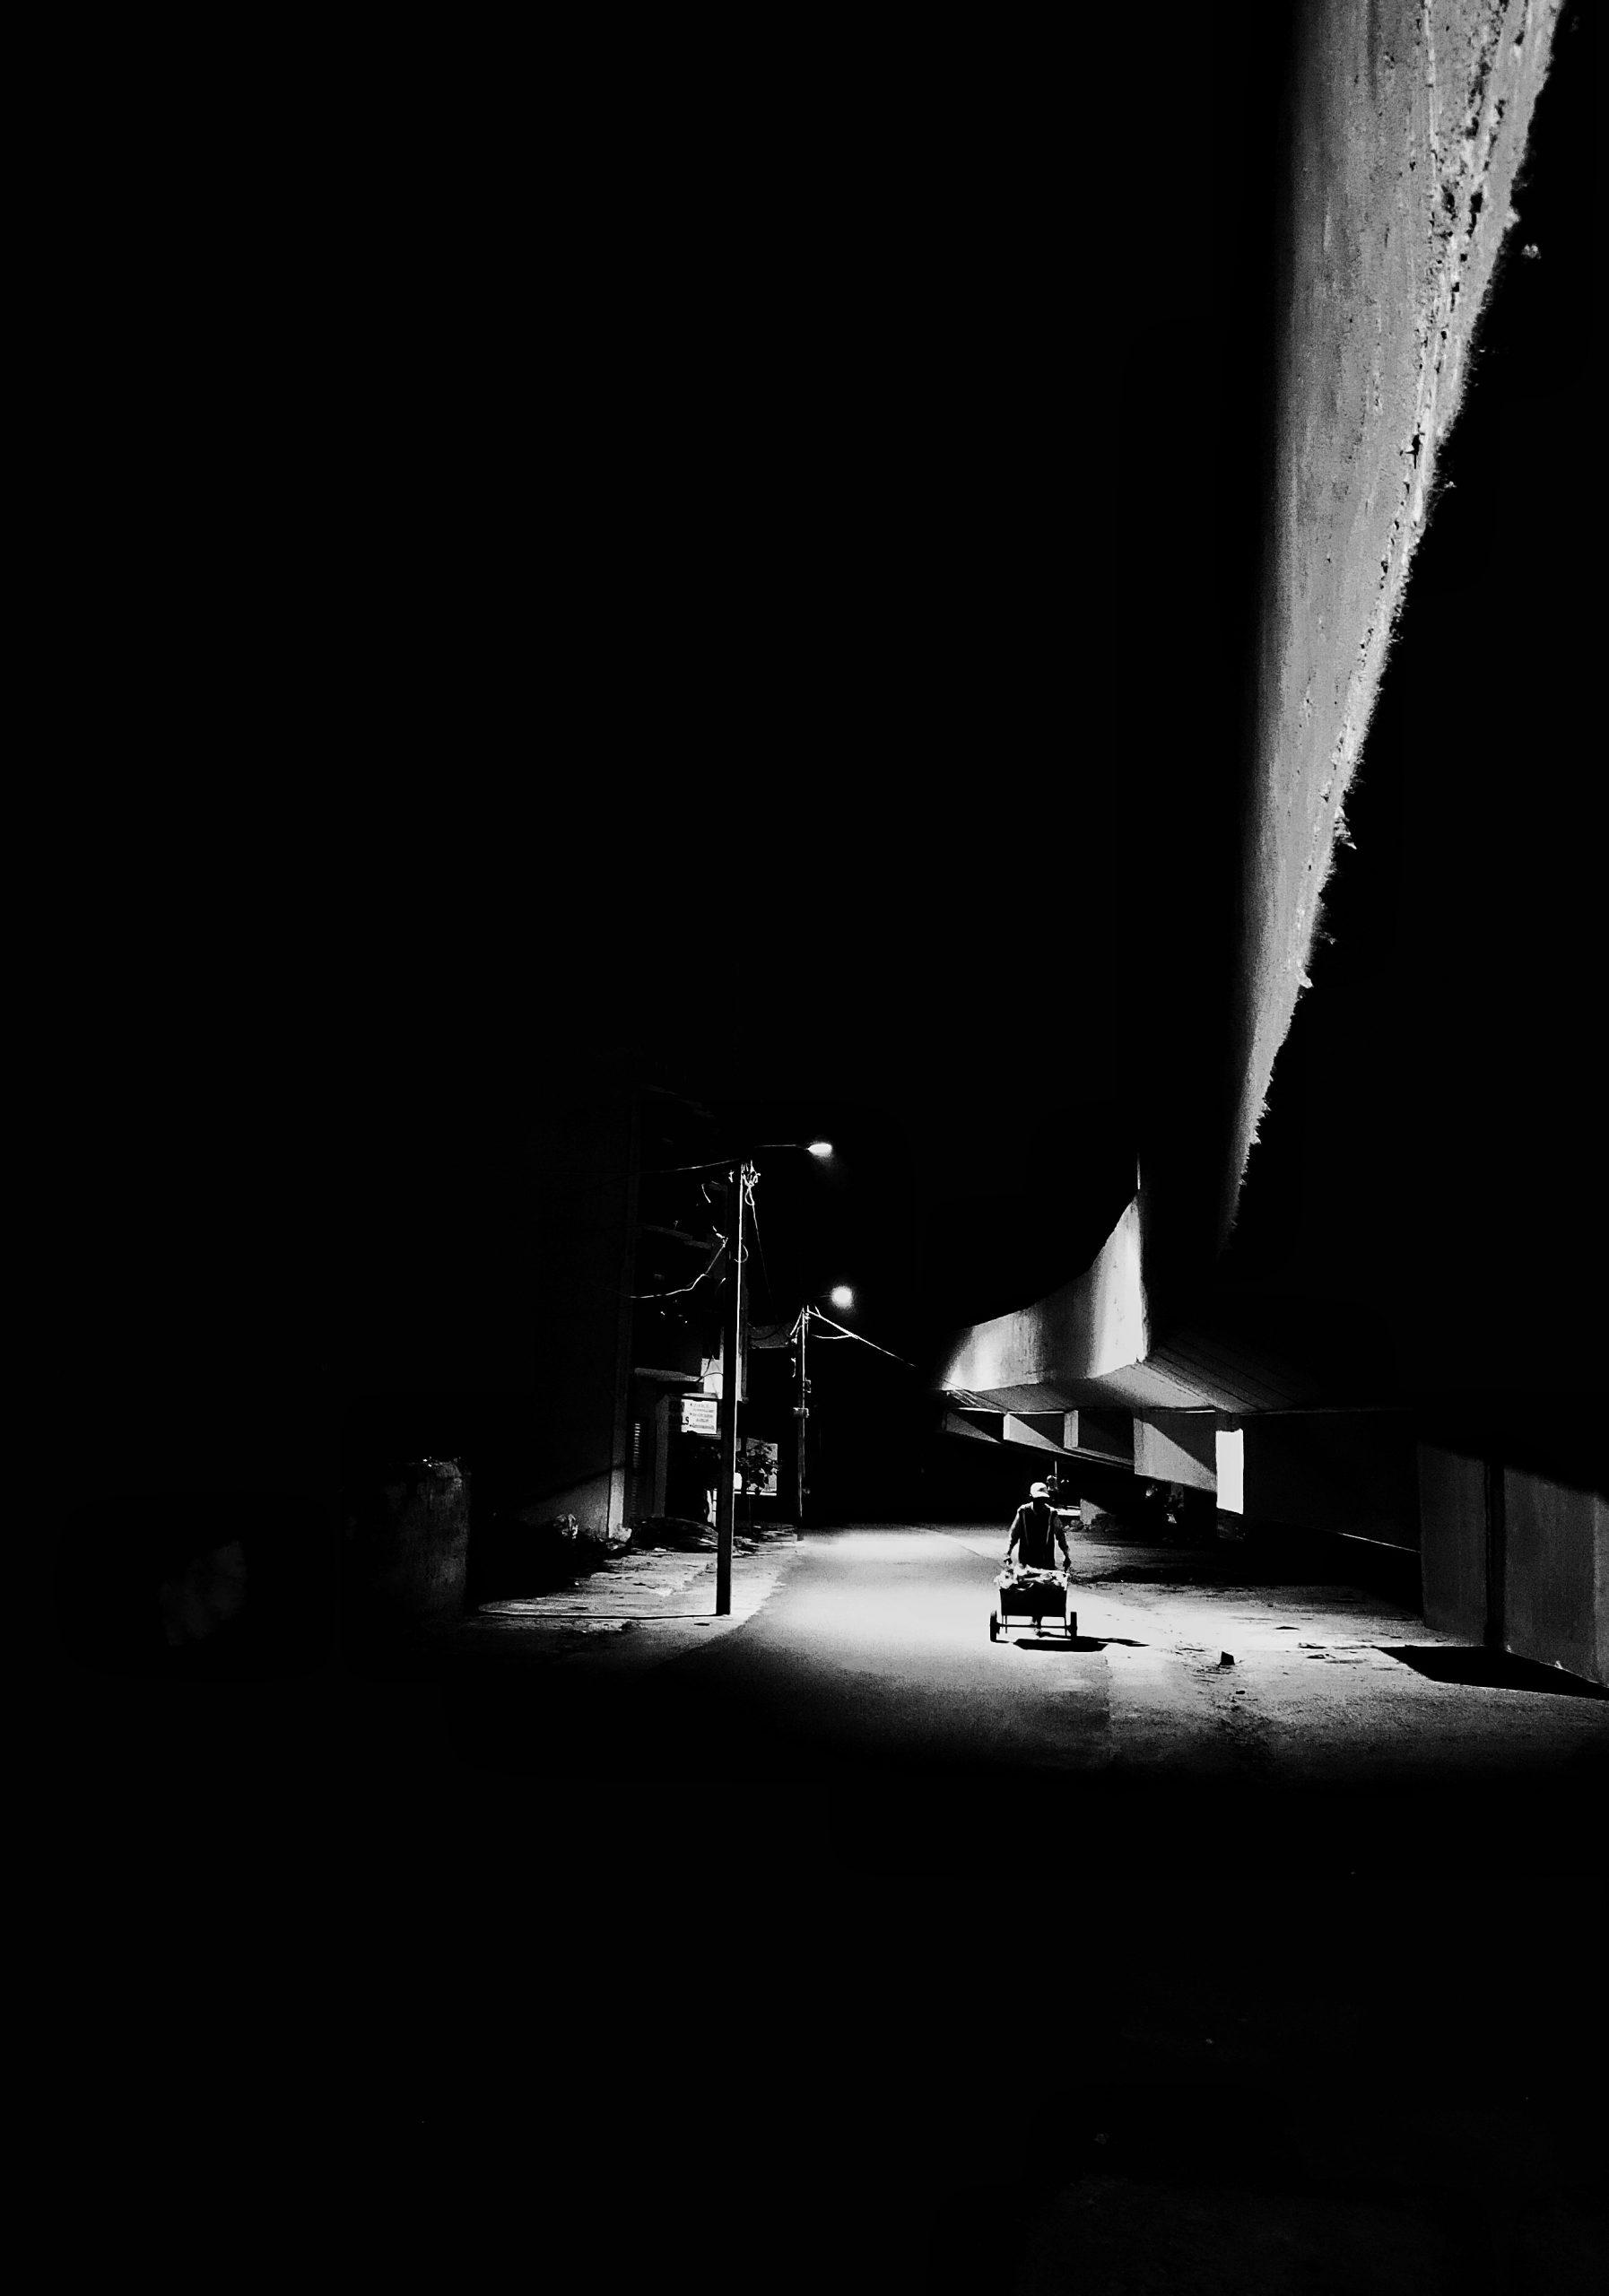 A cyclist going through dark place